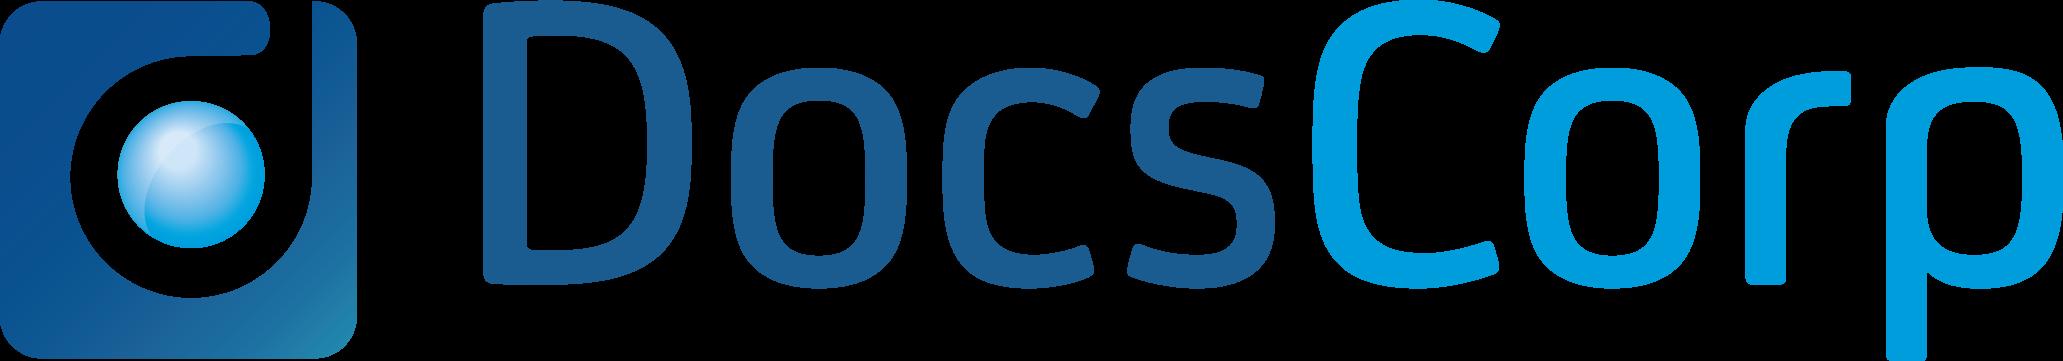 docscorp-logo